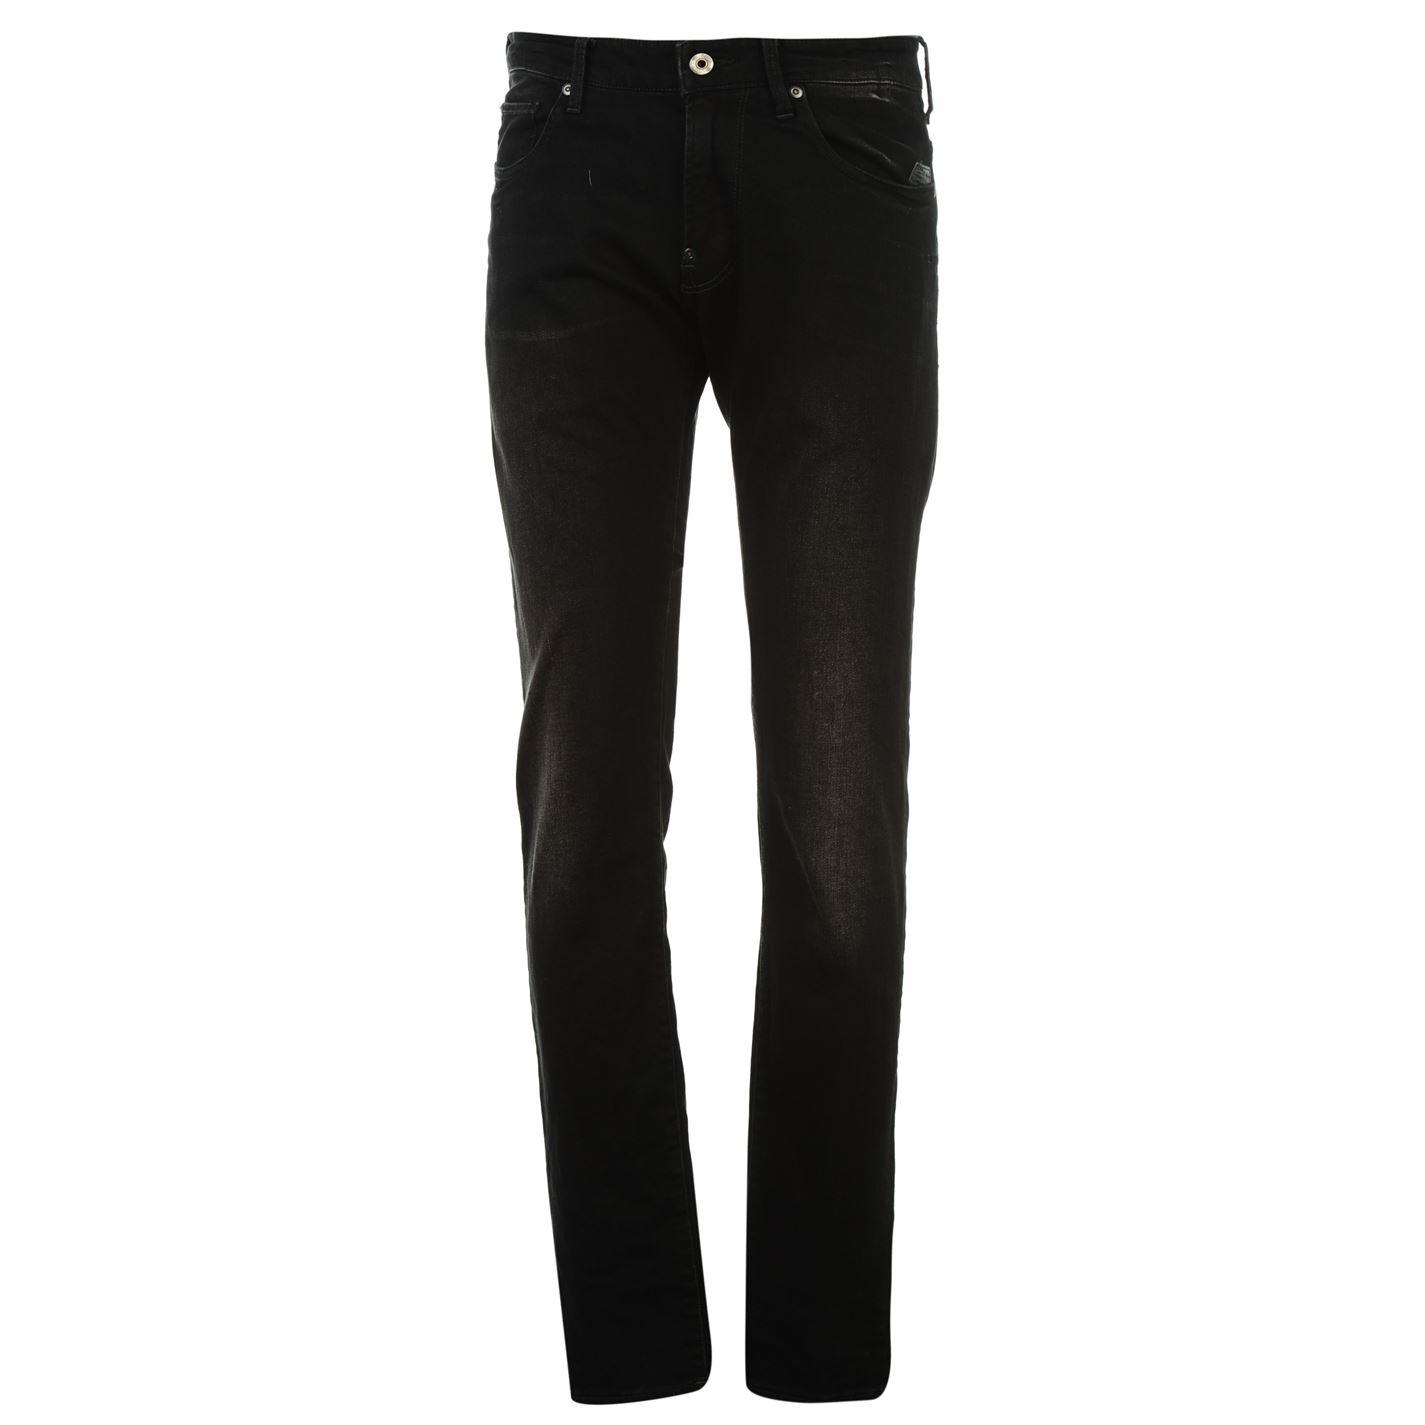 G Star Attacc Super Slim Mens Jeans